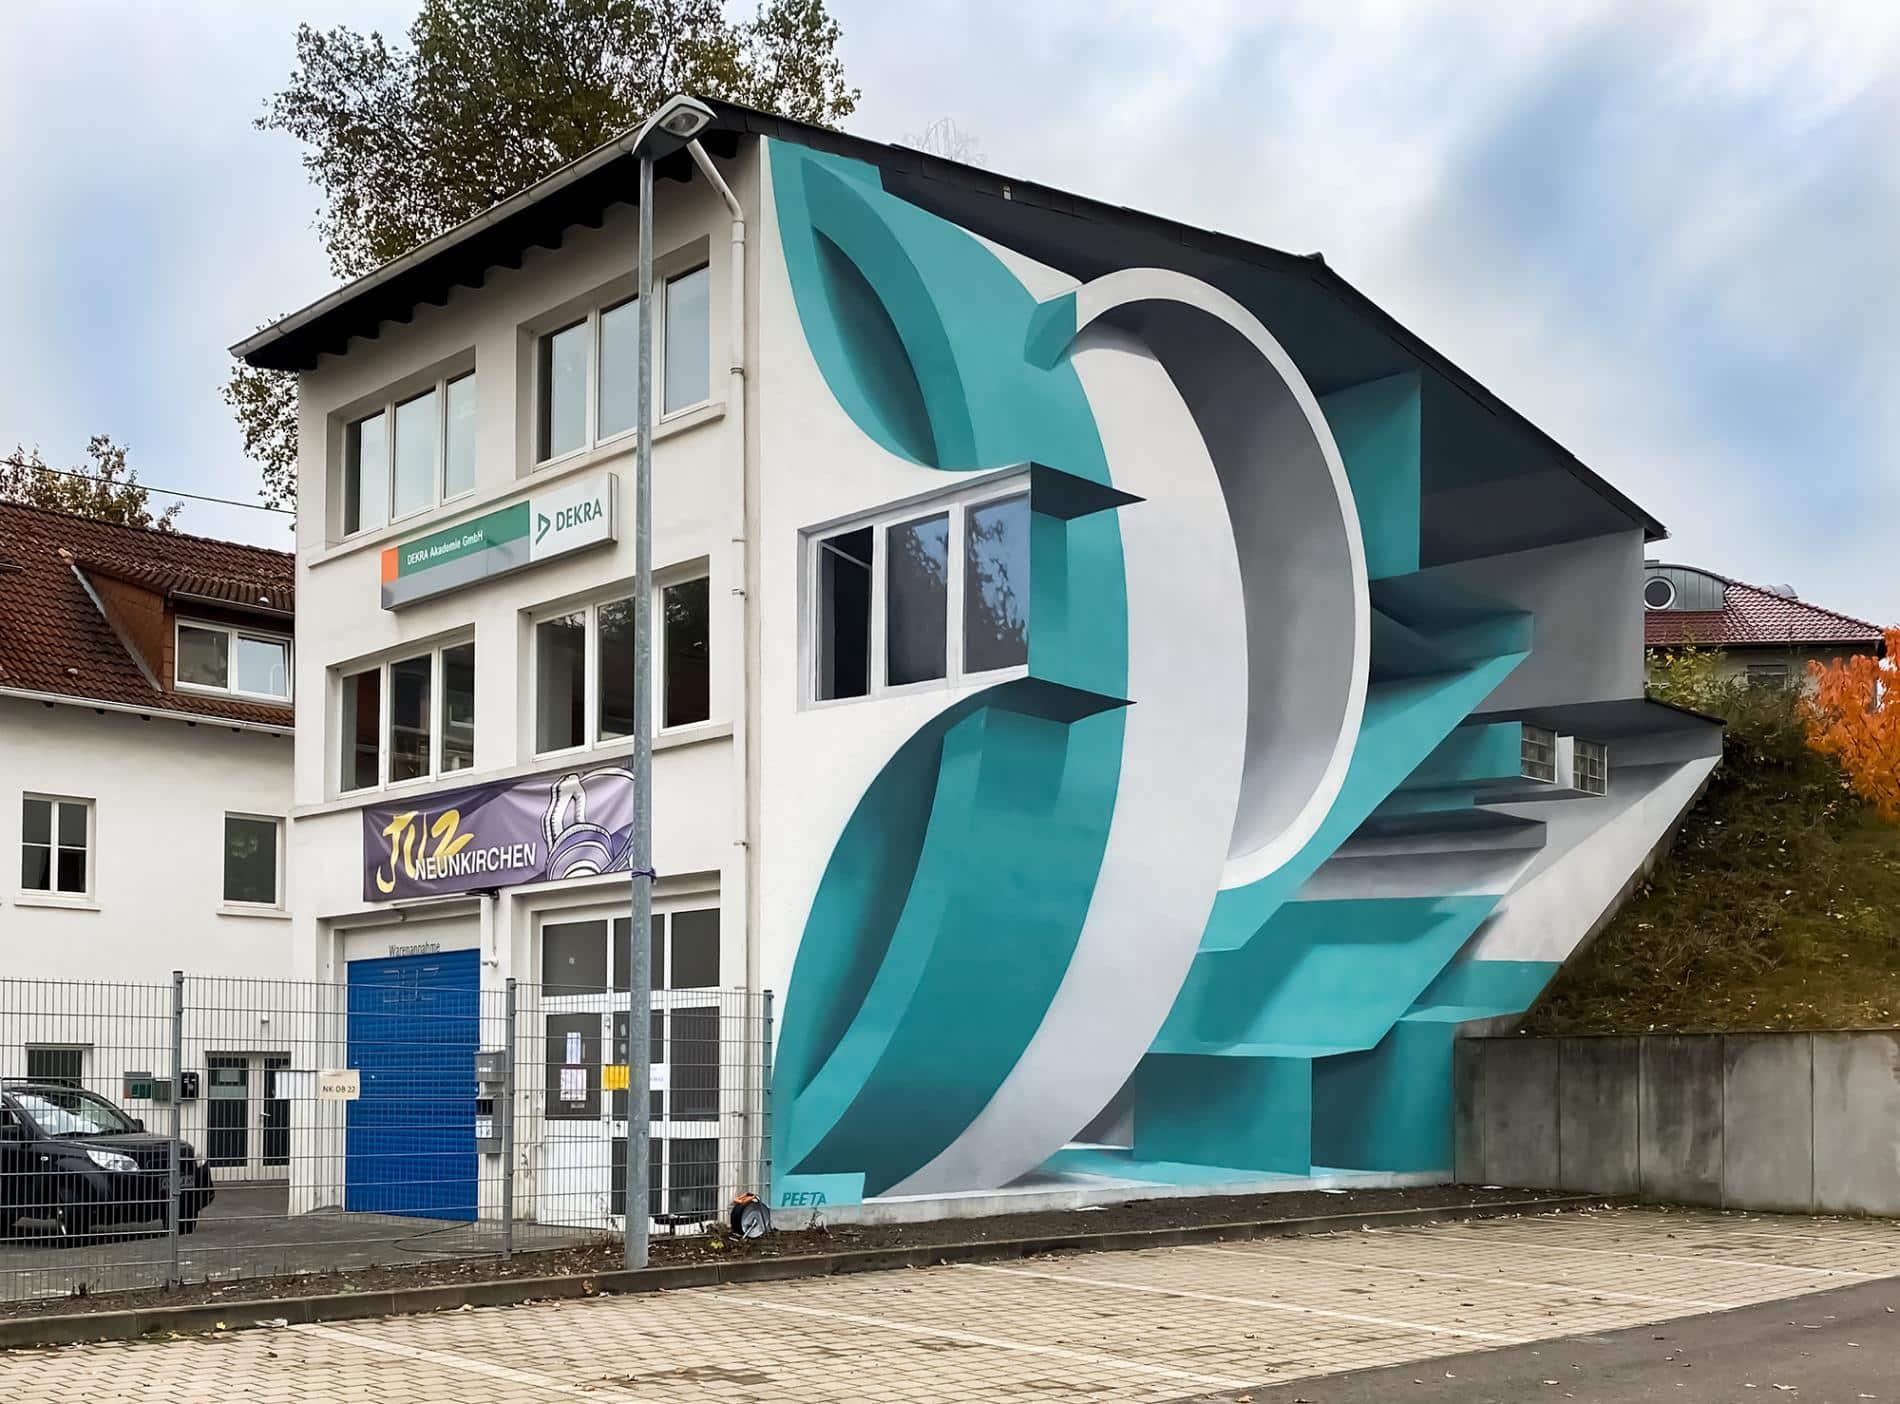 peeta murales anamorficos